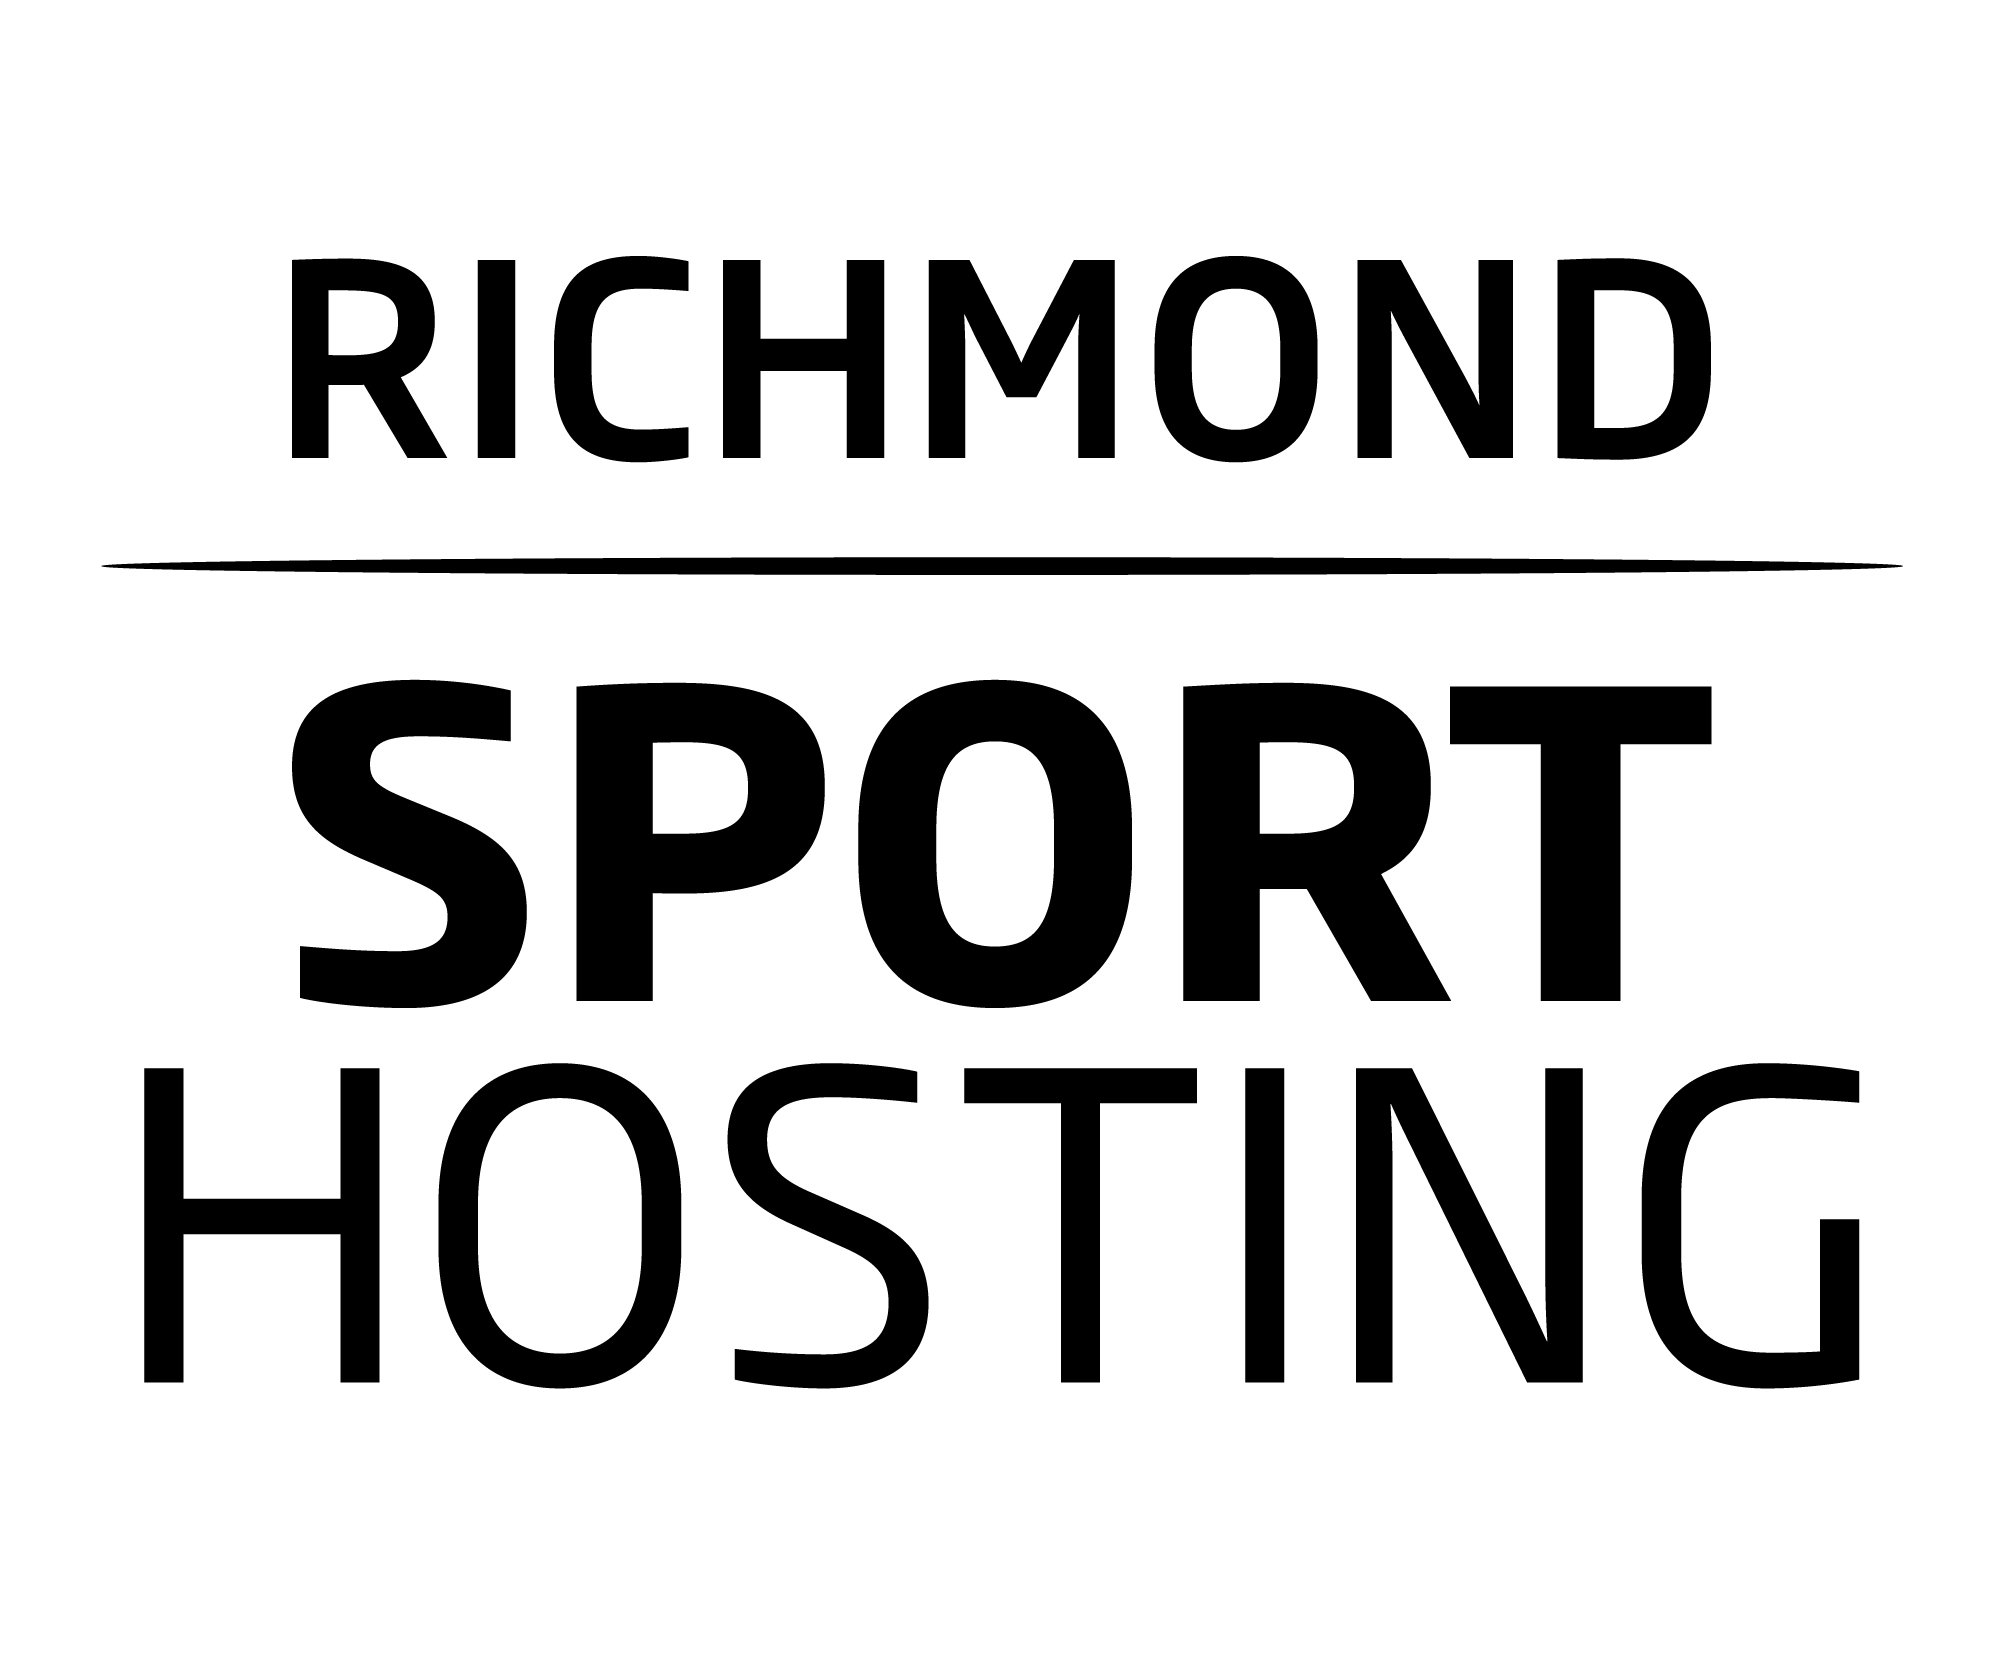 Sprt_Hst_Richmnd-logo_Black